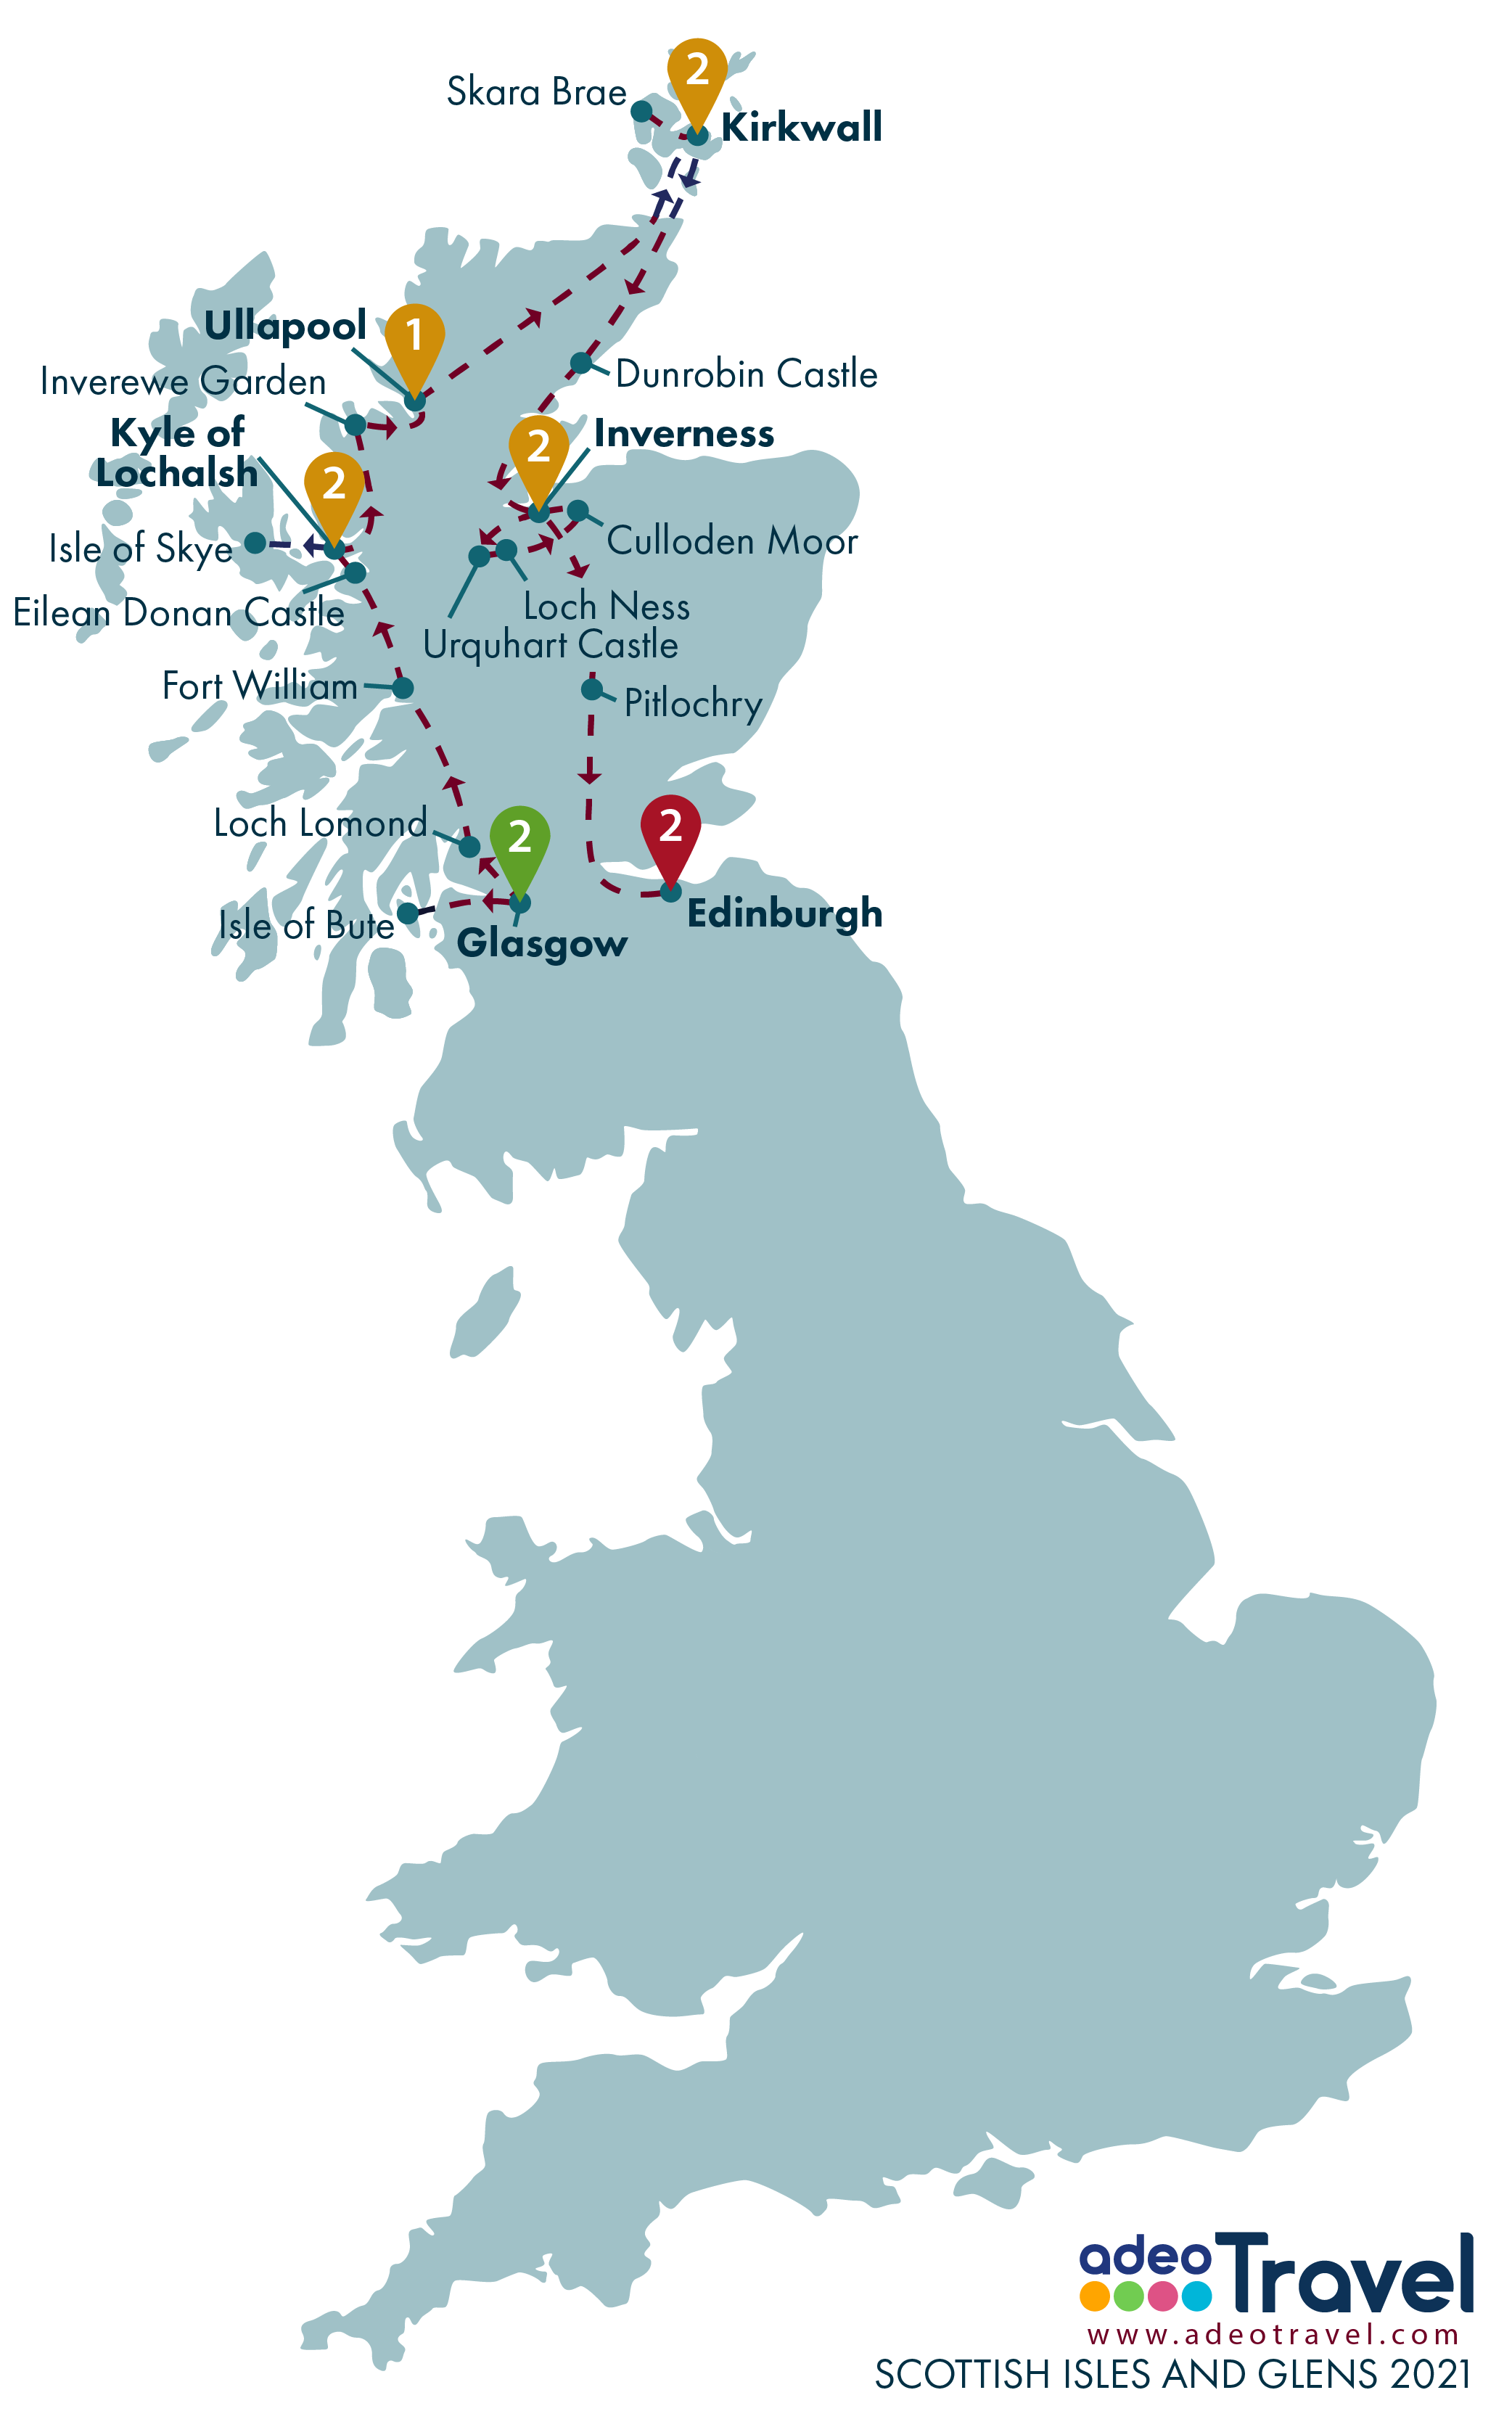 Map - Scottish Isles and Glens 2021